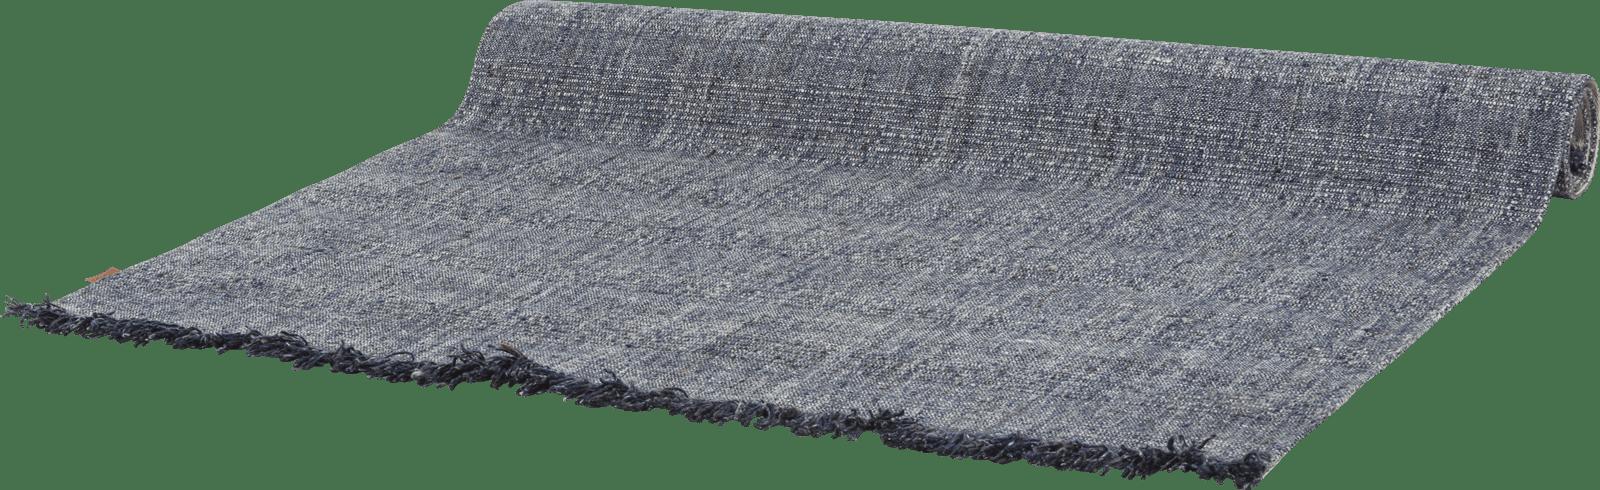 XOOON - Coco Maison - darwin karpet 190x290cm